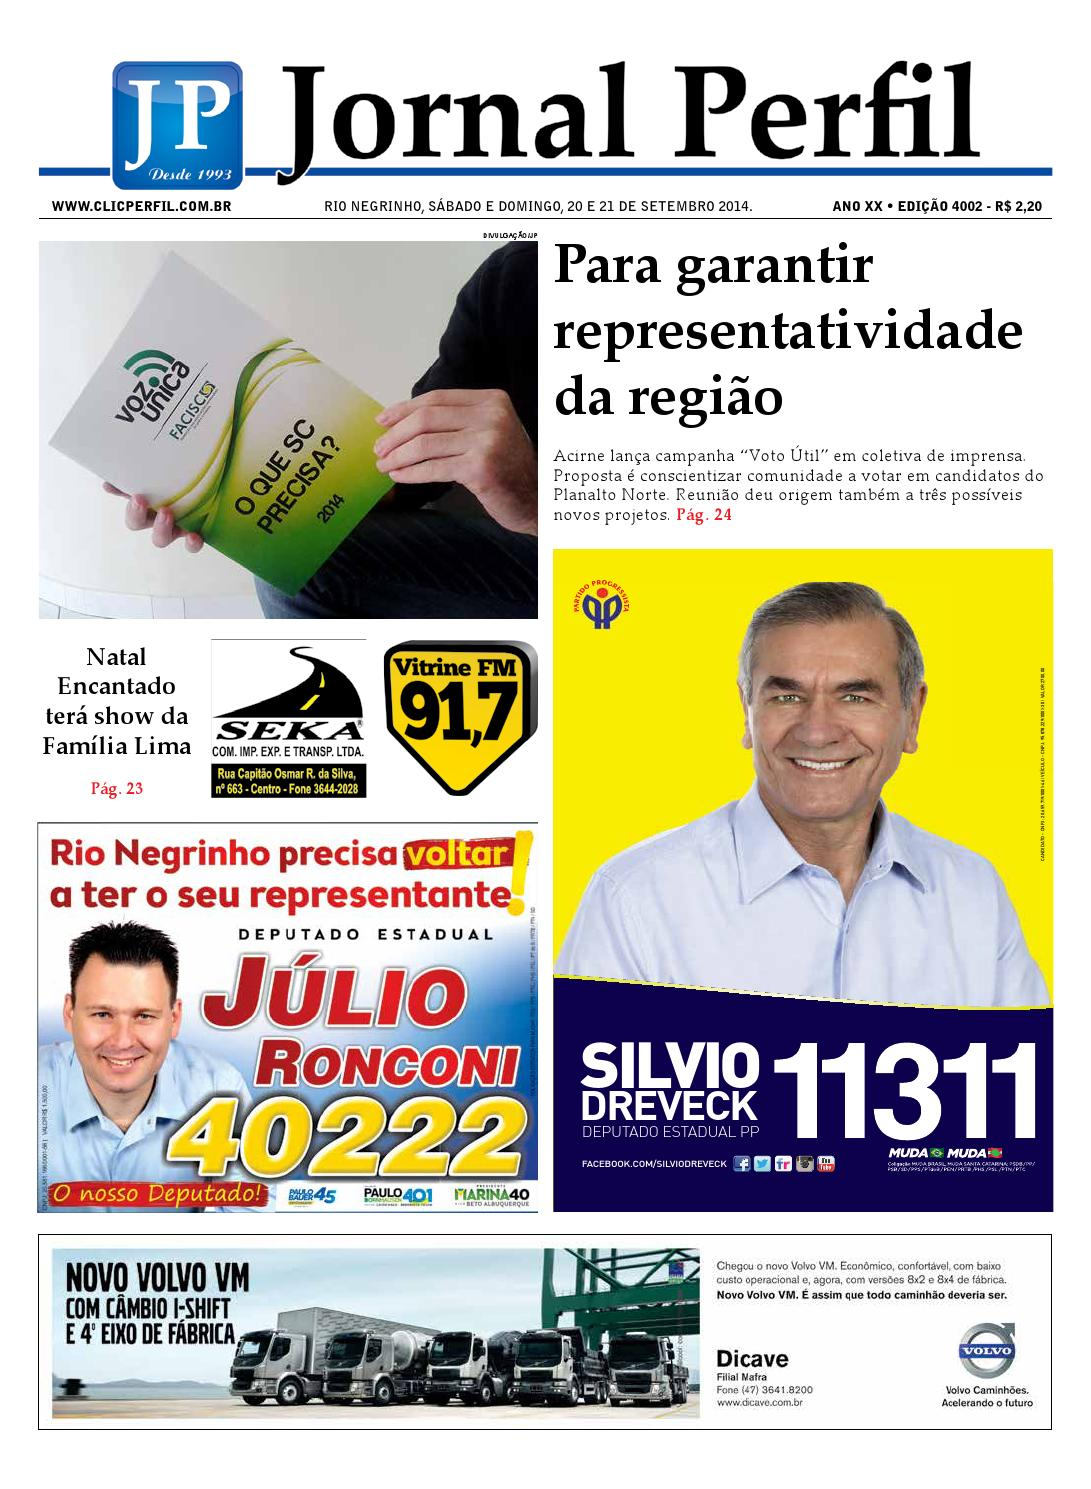 c2333e0c0c Jornal perfil 20 09 14 by ClicPerfil - issuu